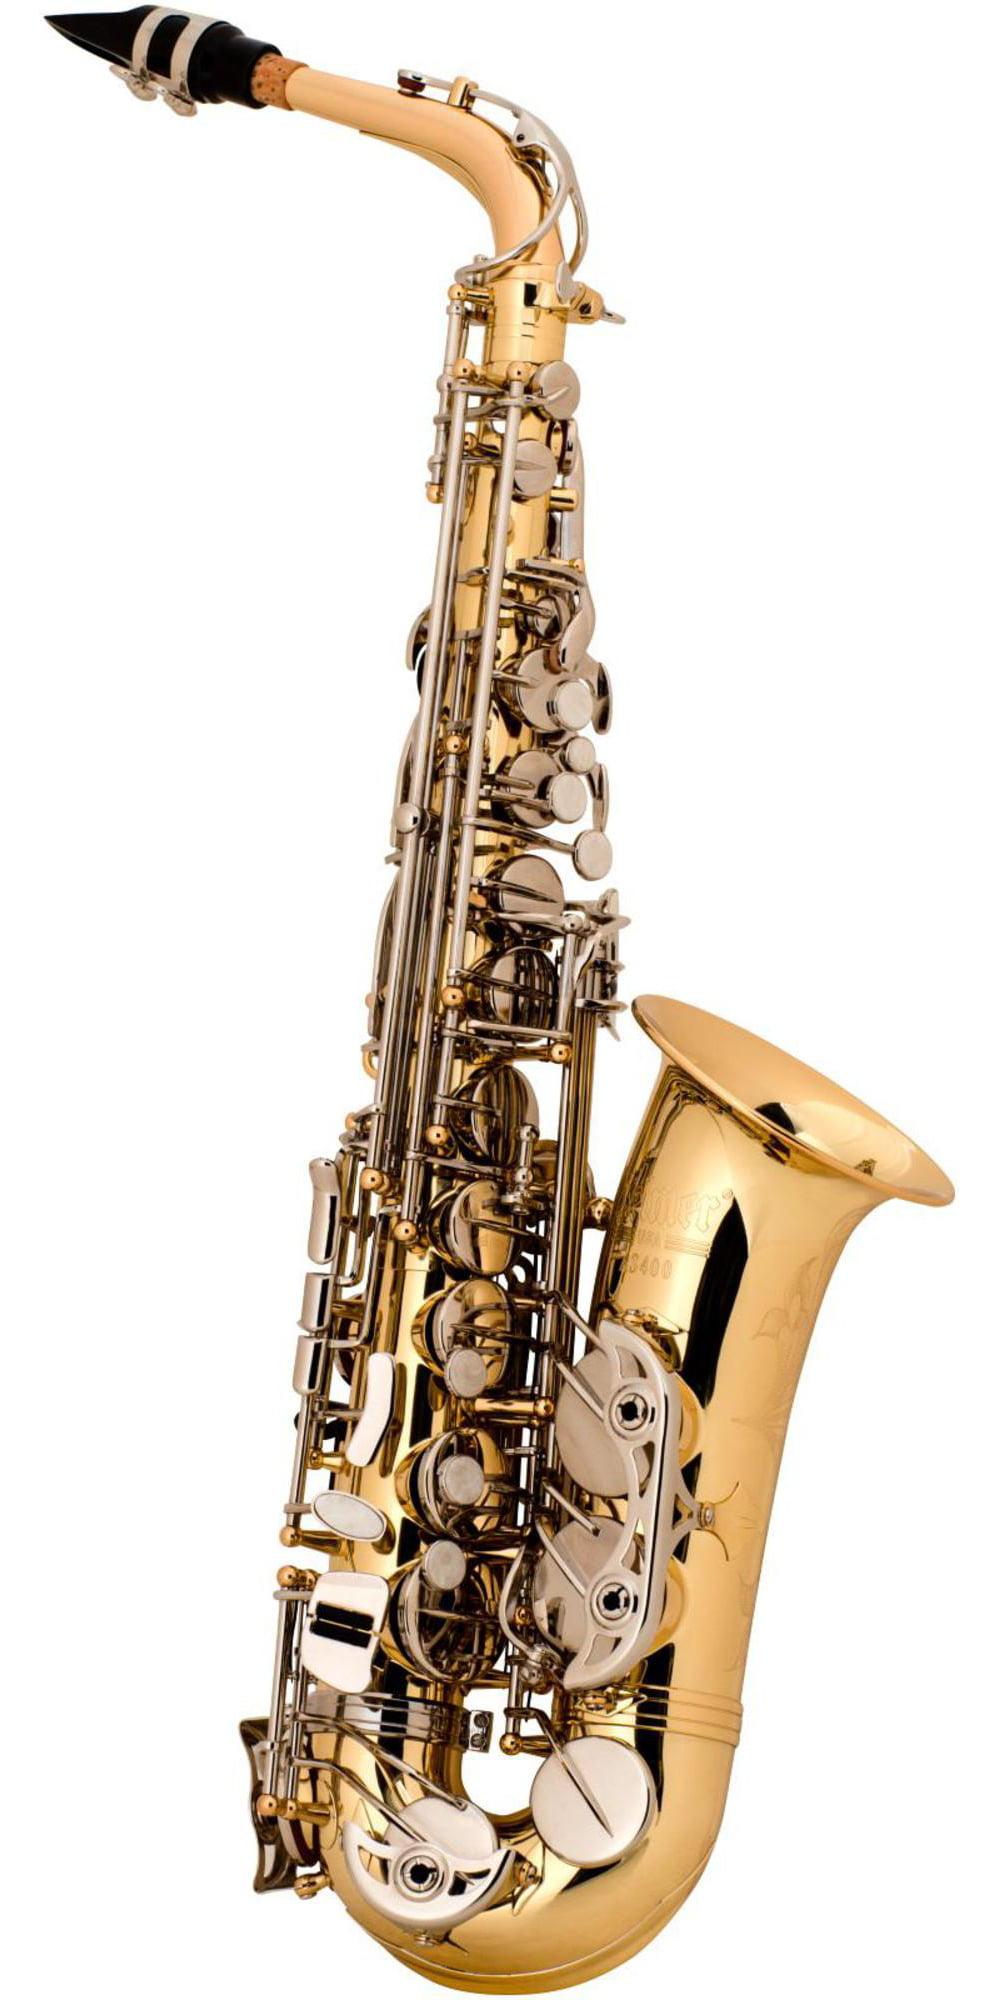 Selmer 400 Series Alto Saxophone by Selmer